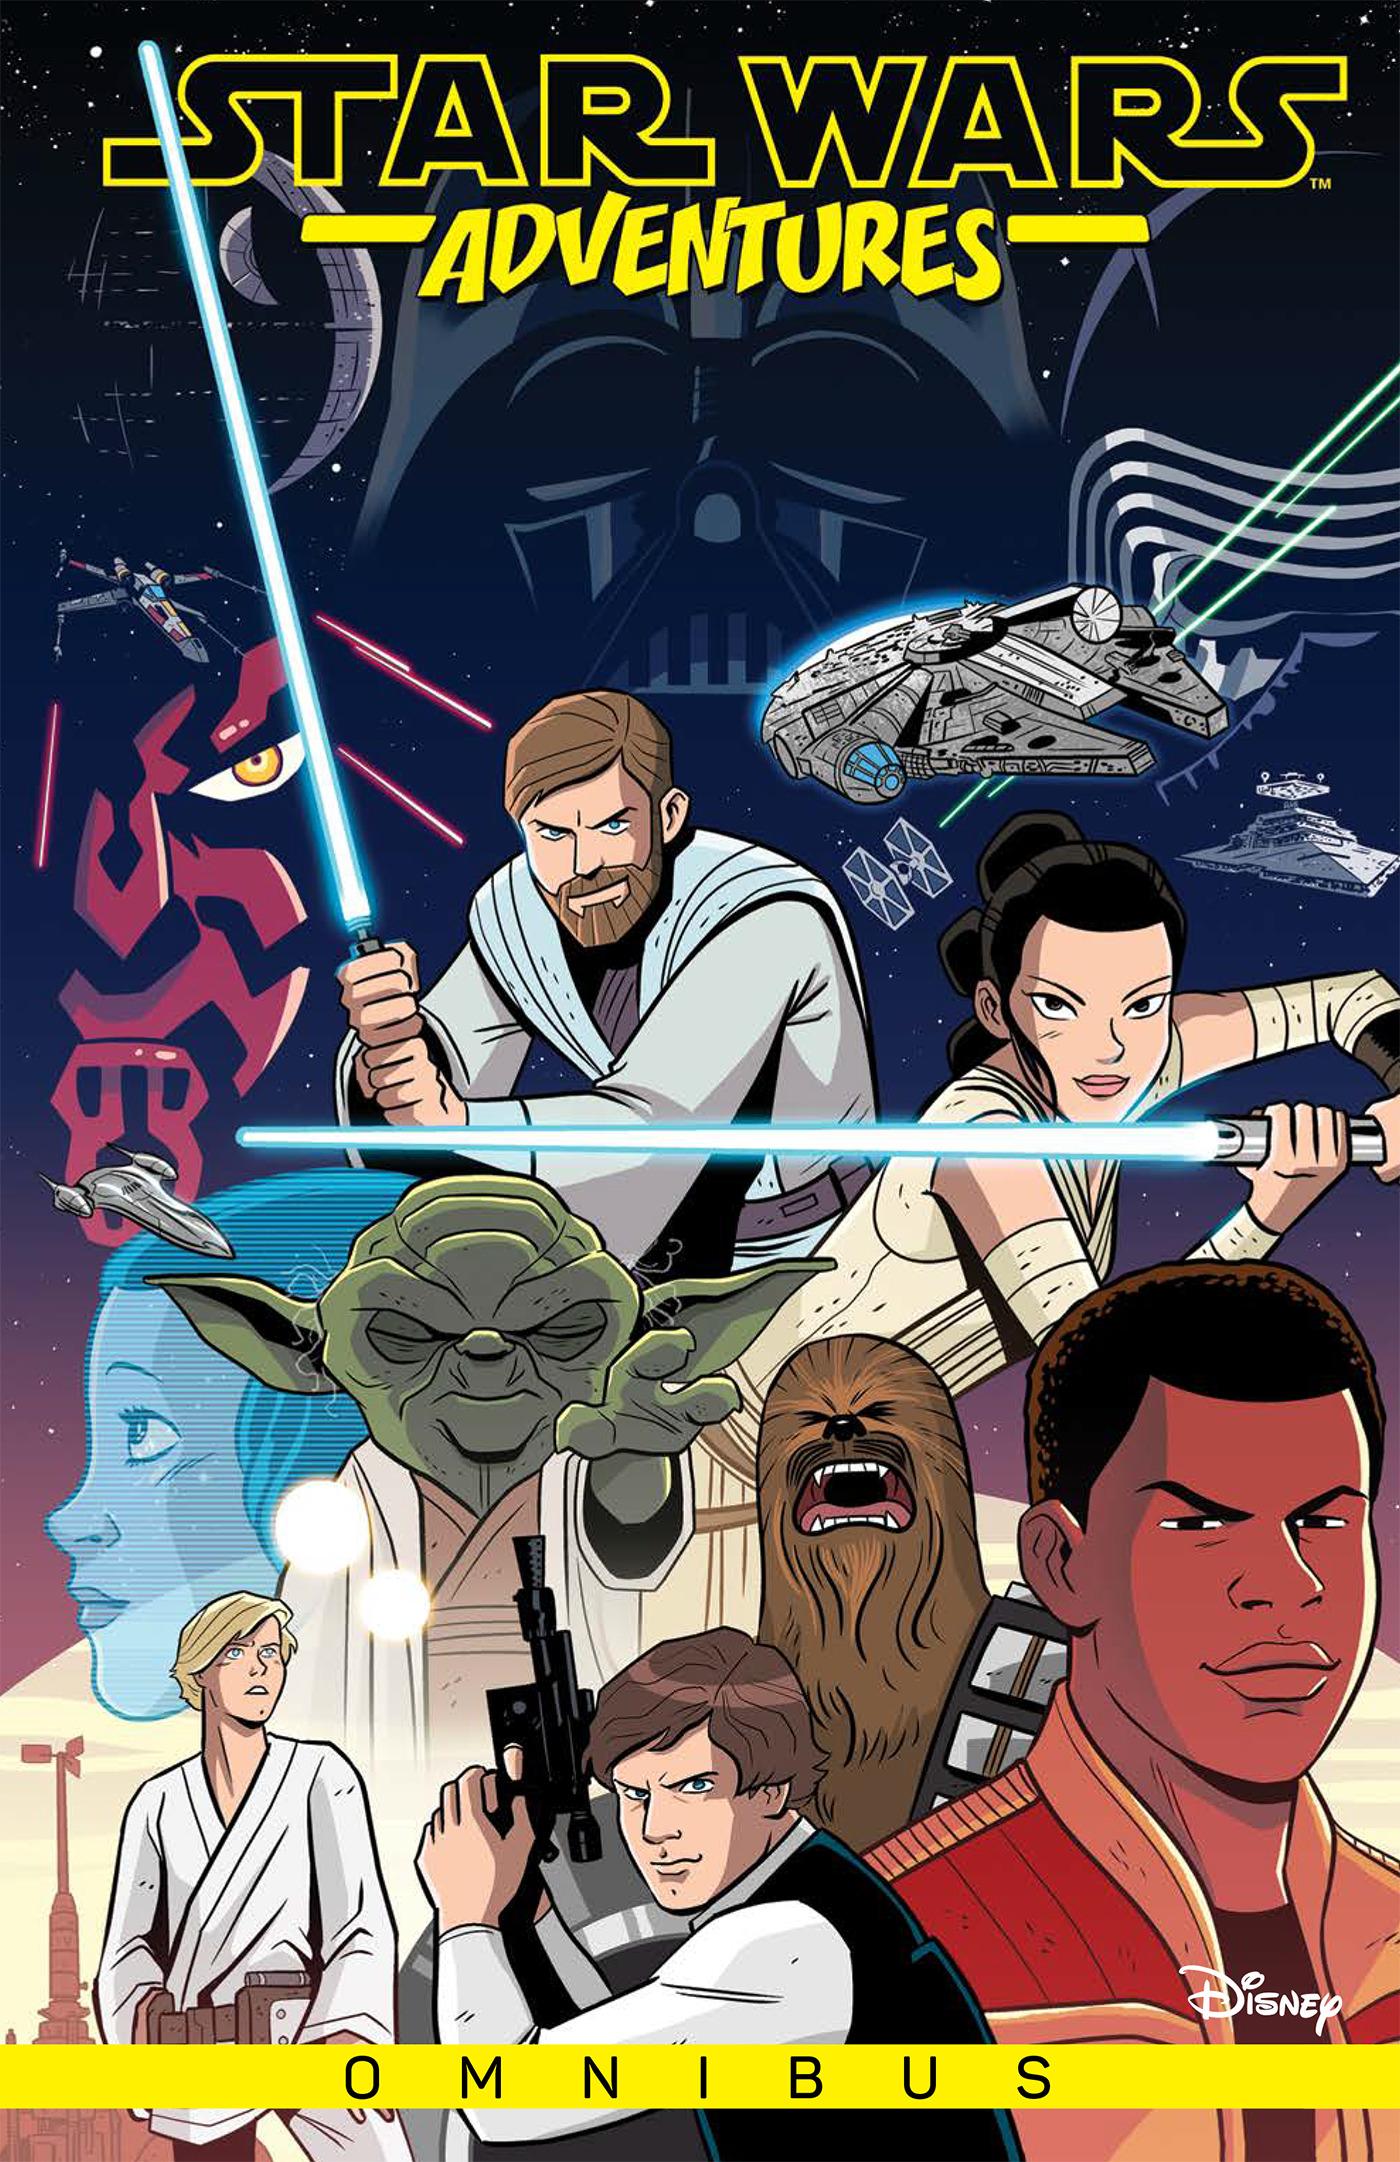 Star Wars Adventures Omnibus Volume 1 (07.01.2020)